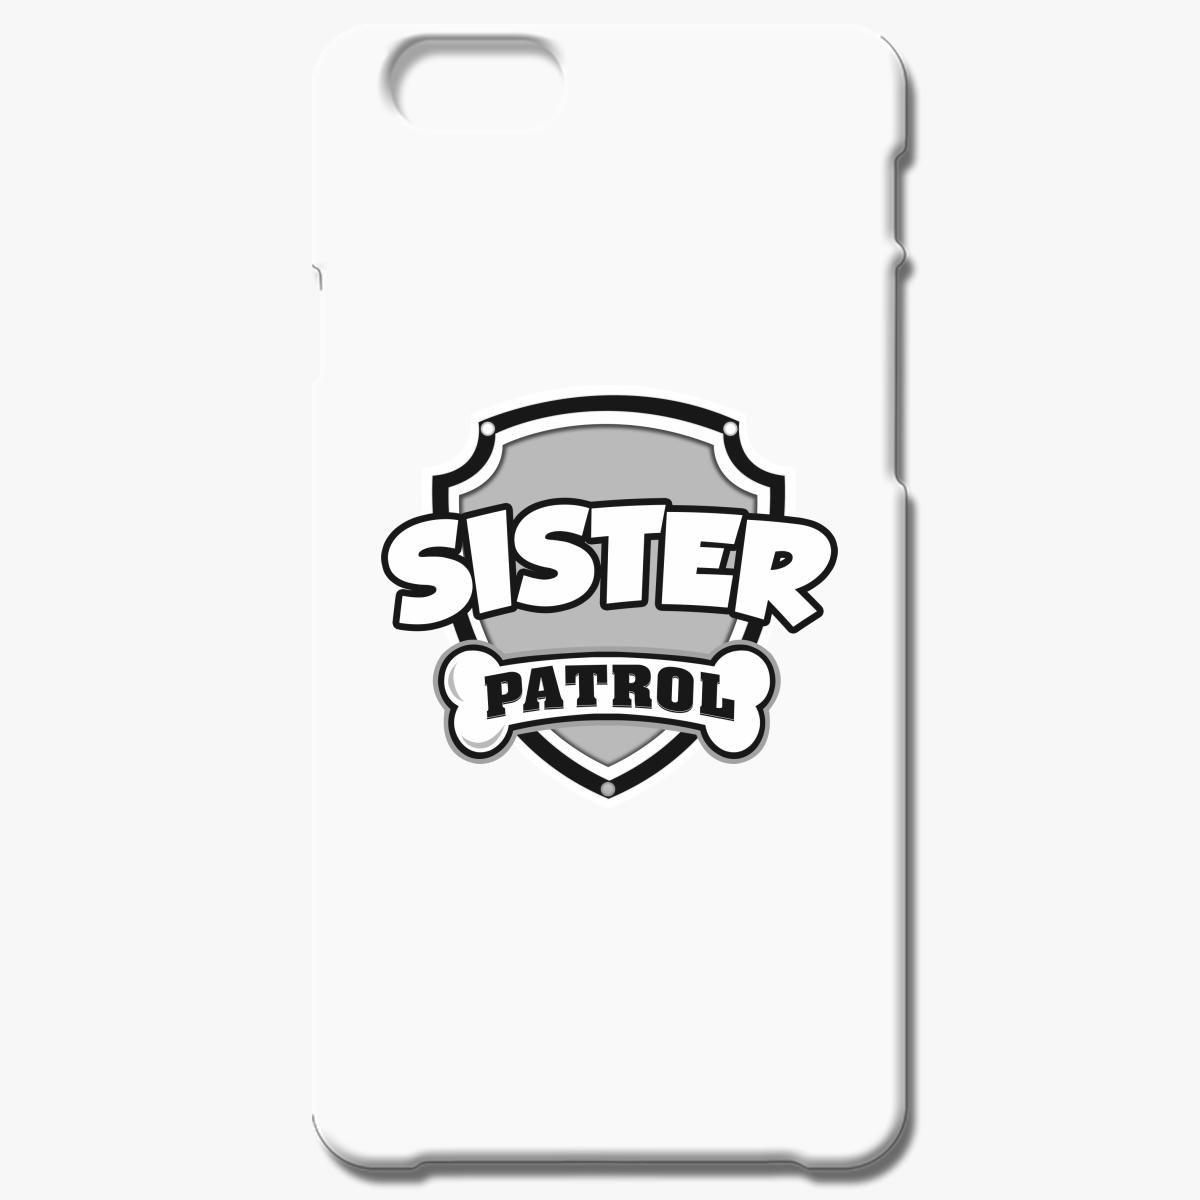 Sister Patrol Iphone 6 6s Case